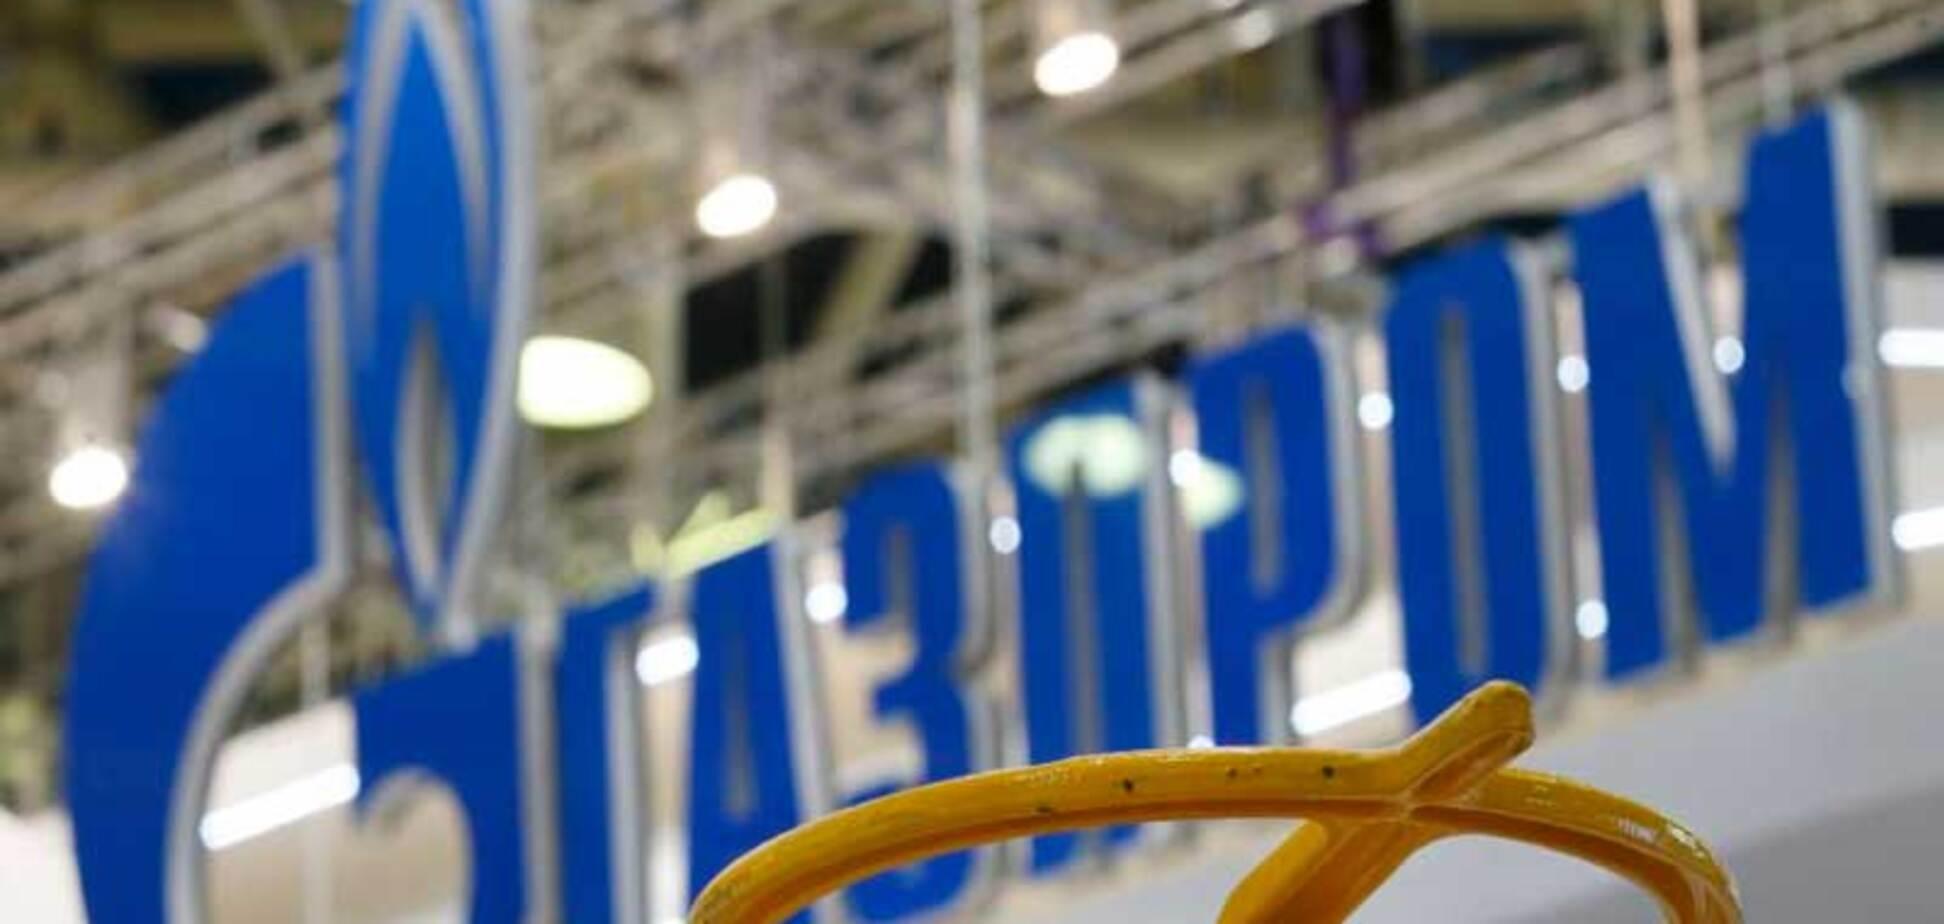 'Нафтогазу' на заметку: экономист назвал сроки отказа 'Газпрома' от украинской ГТС